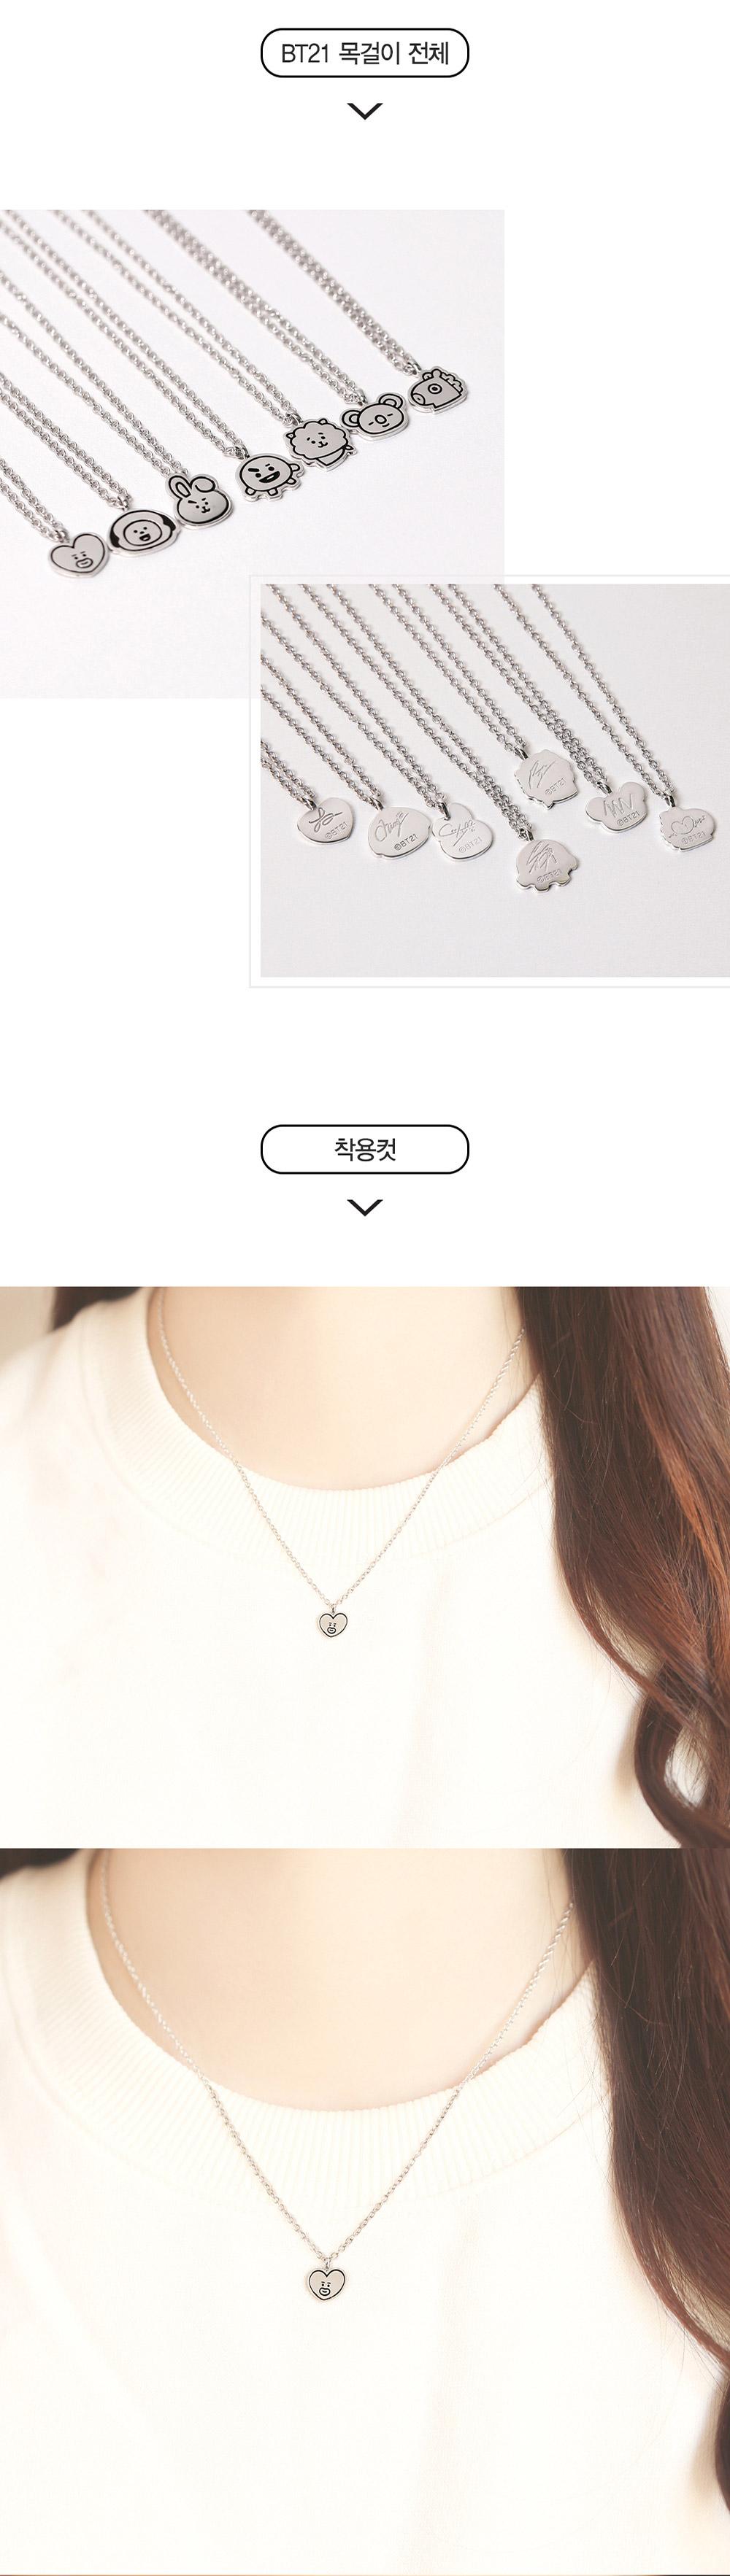 bt21_ost_necklace_02.jpg